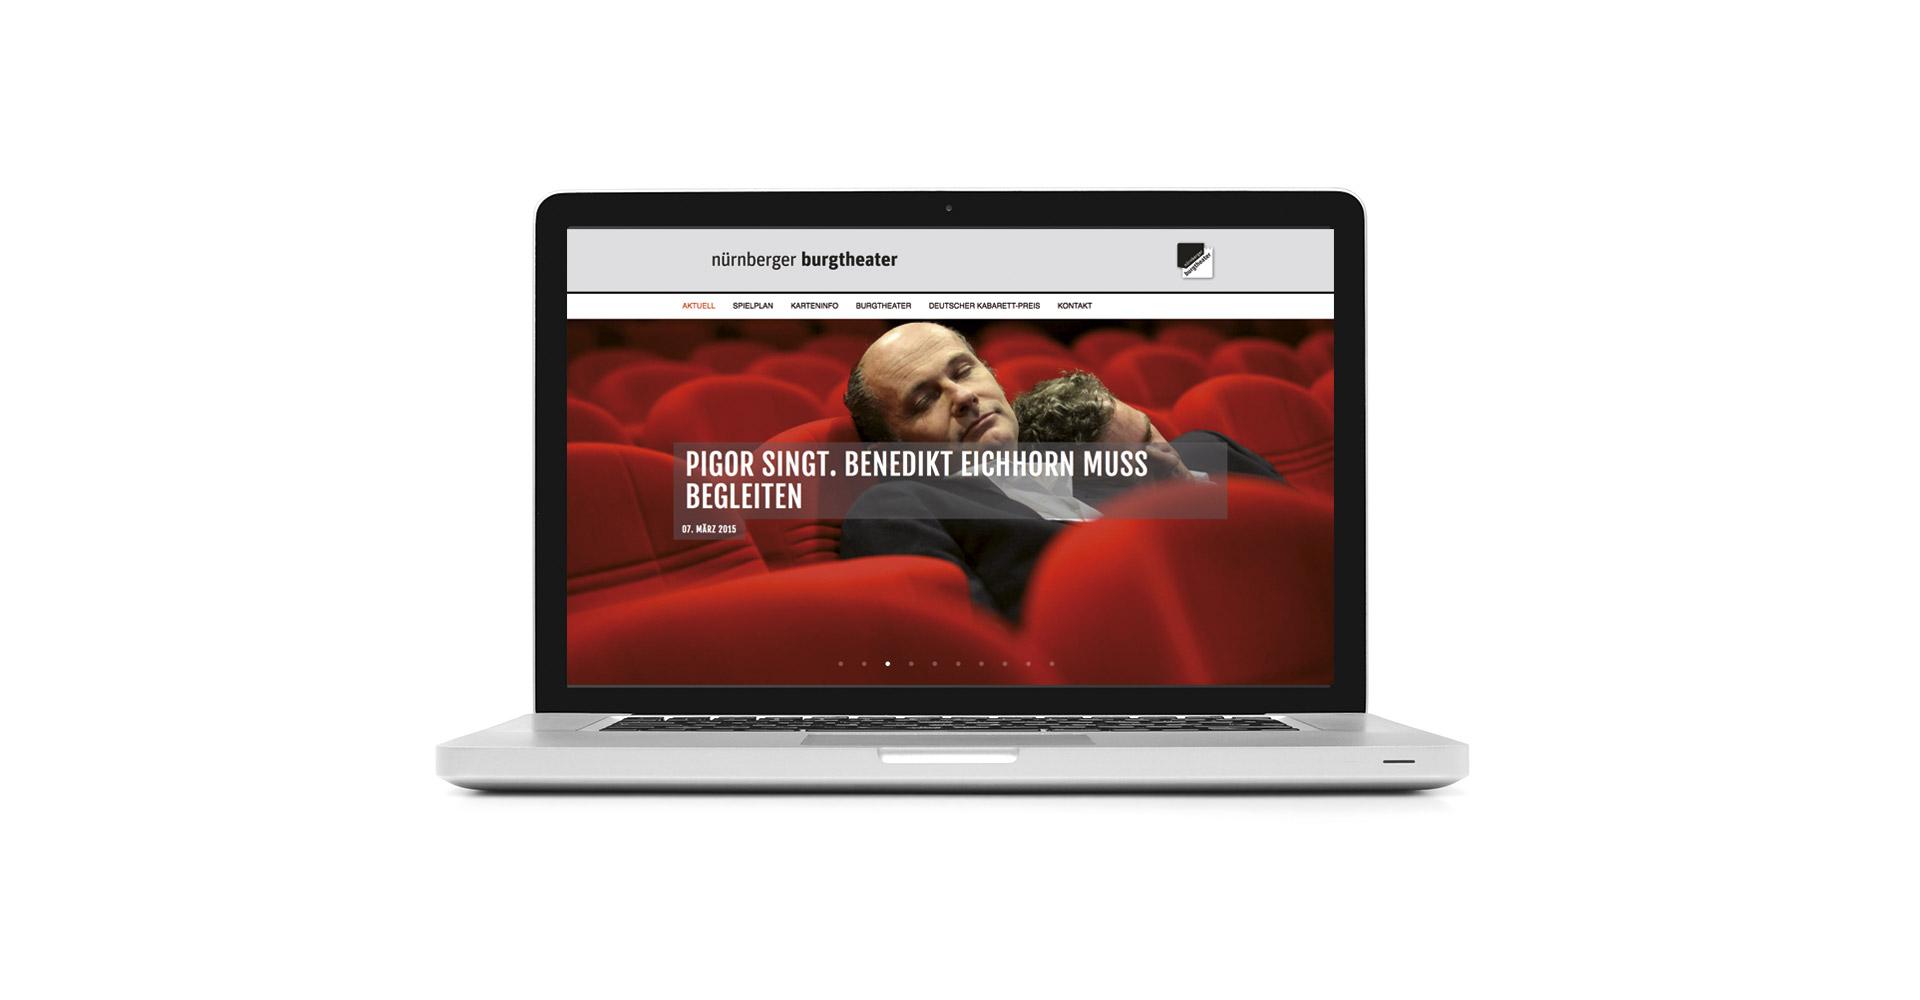 Petra Zimmerer, Büro für Gestaltung, Nürnberger Burgtheater Webseite